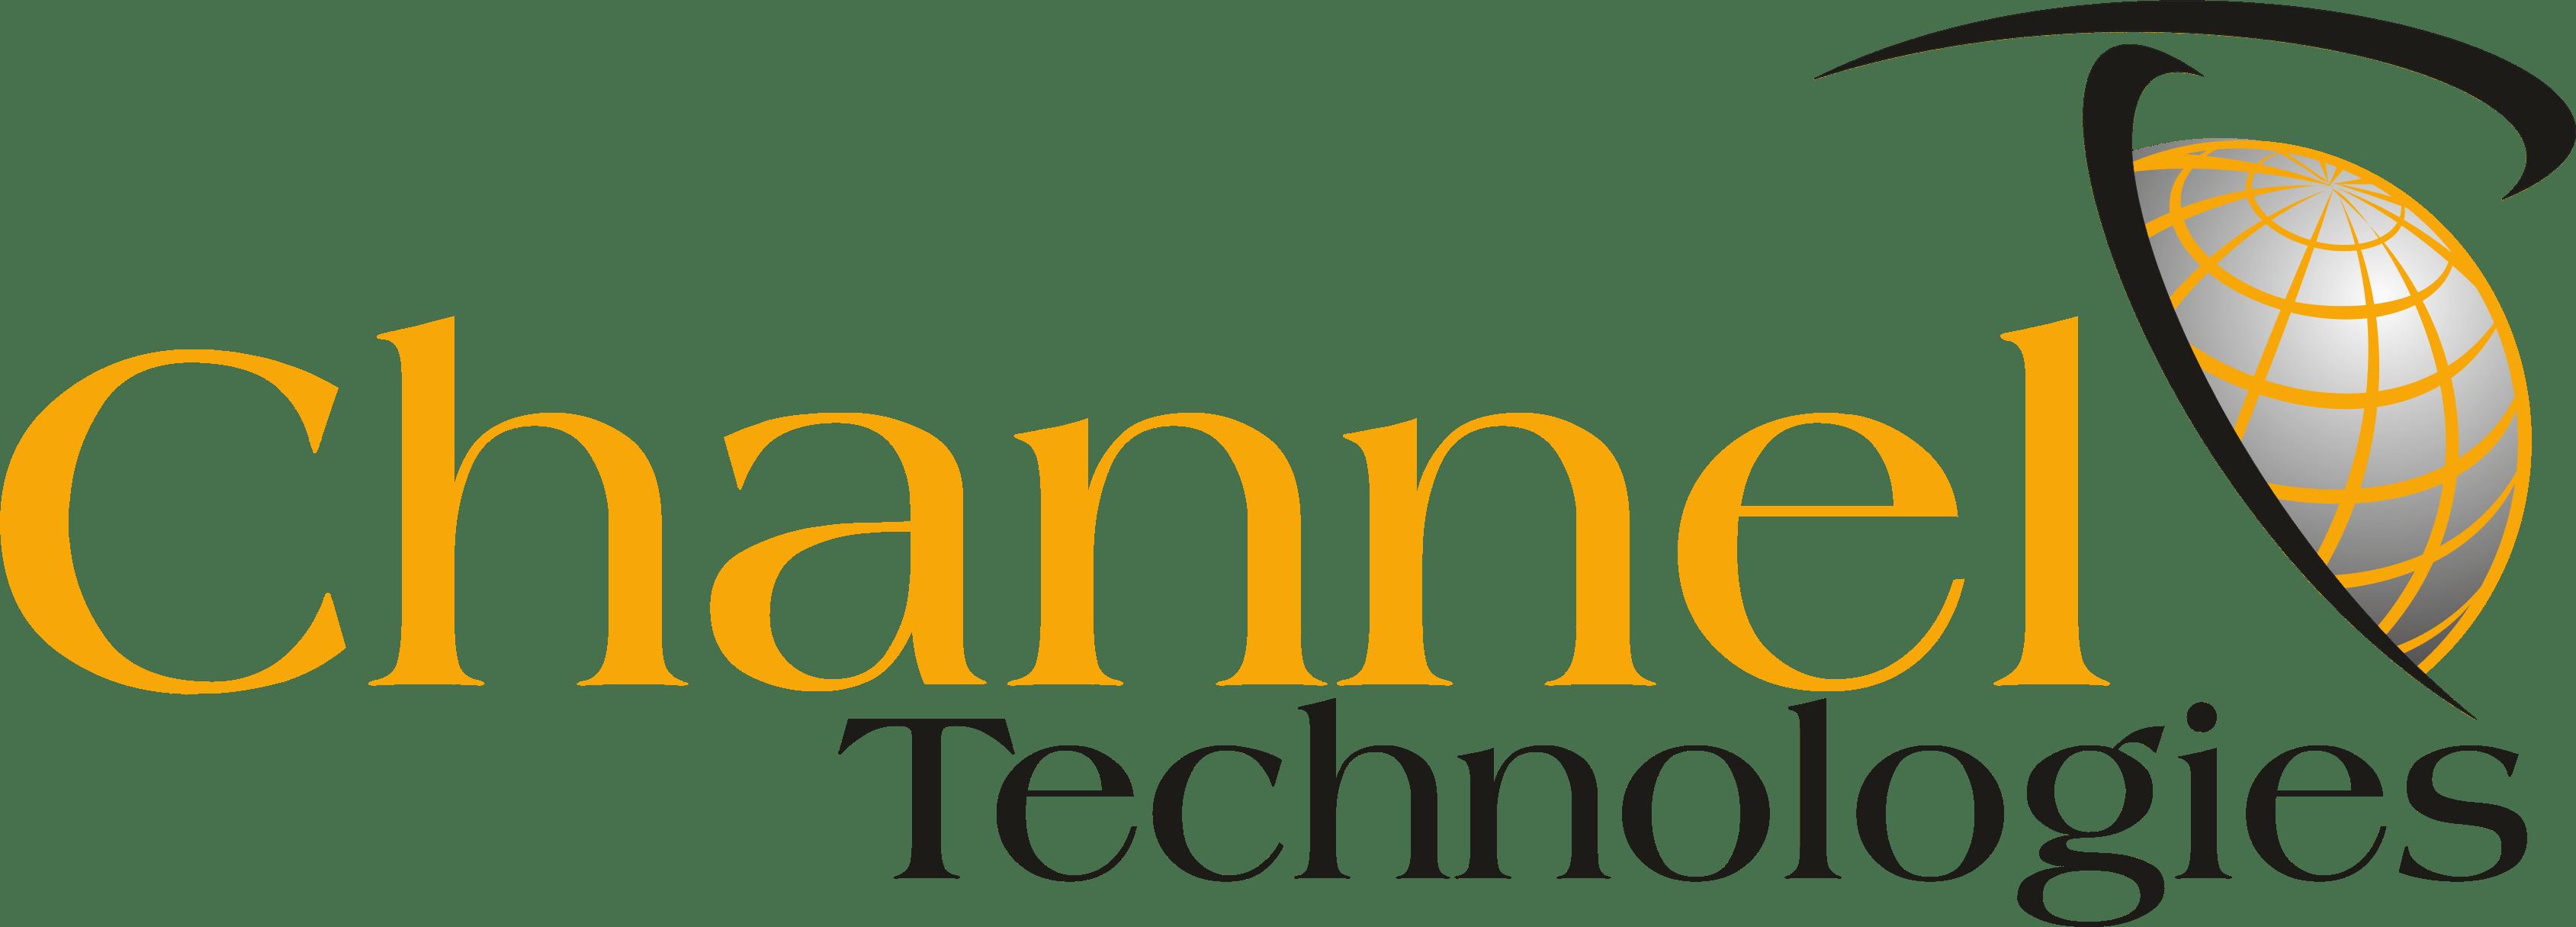 Channel Technologies Pvt. Ltd.